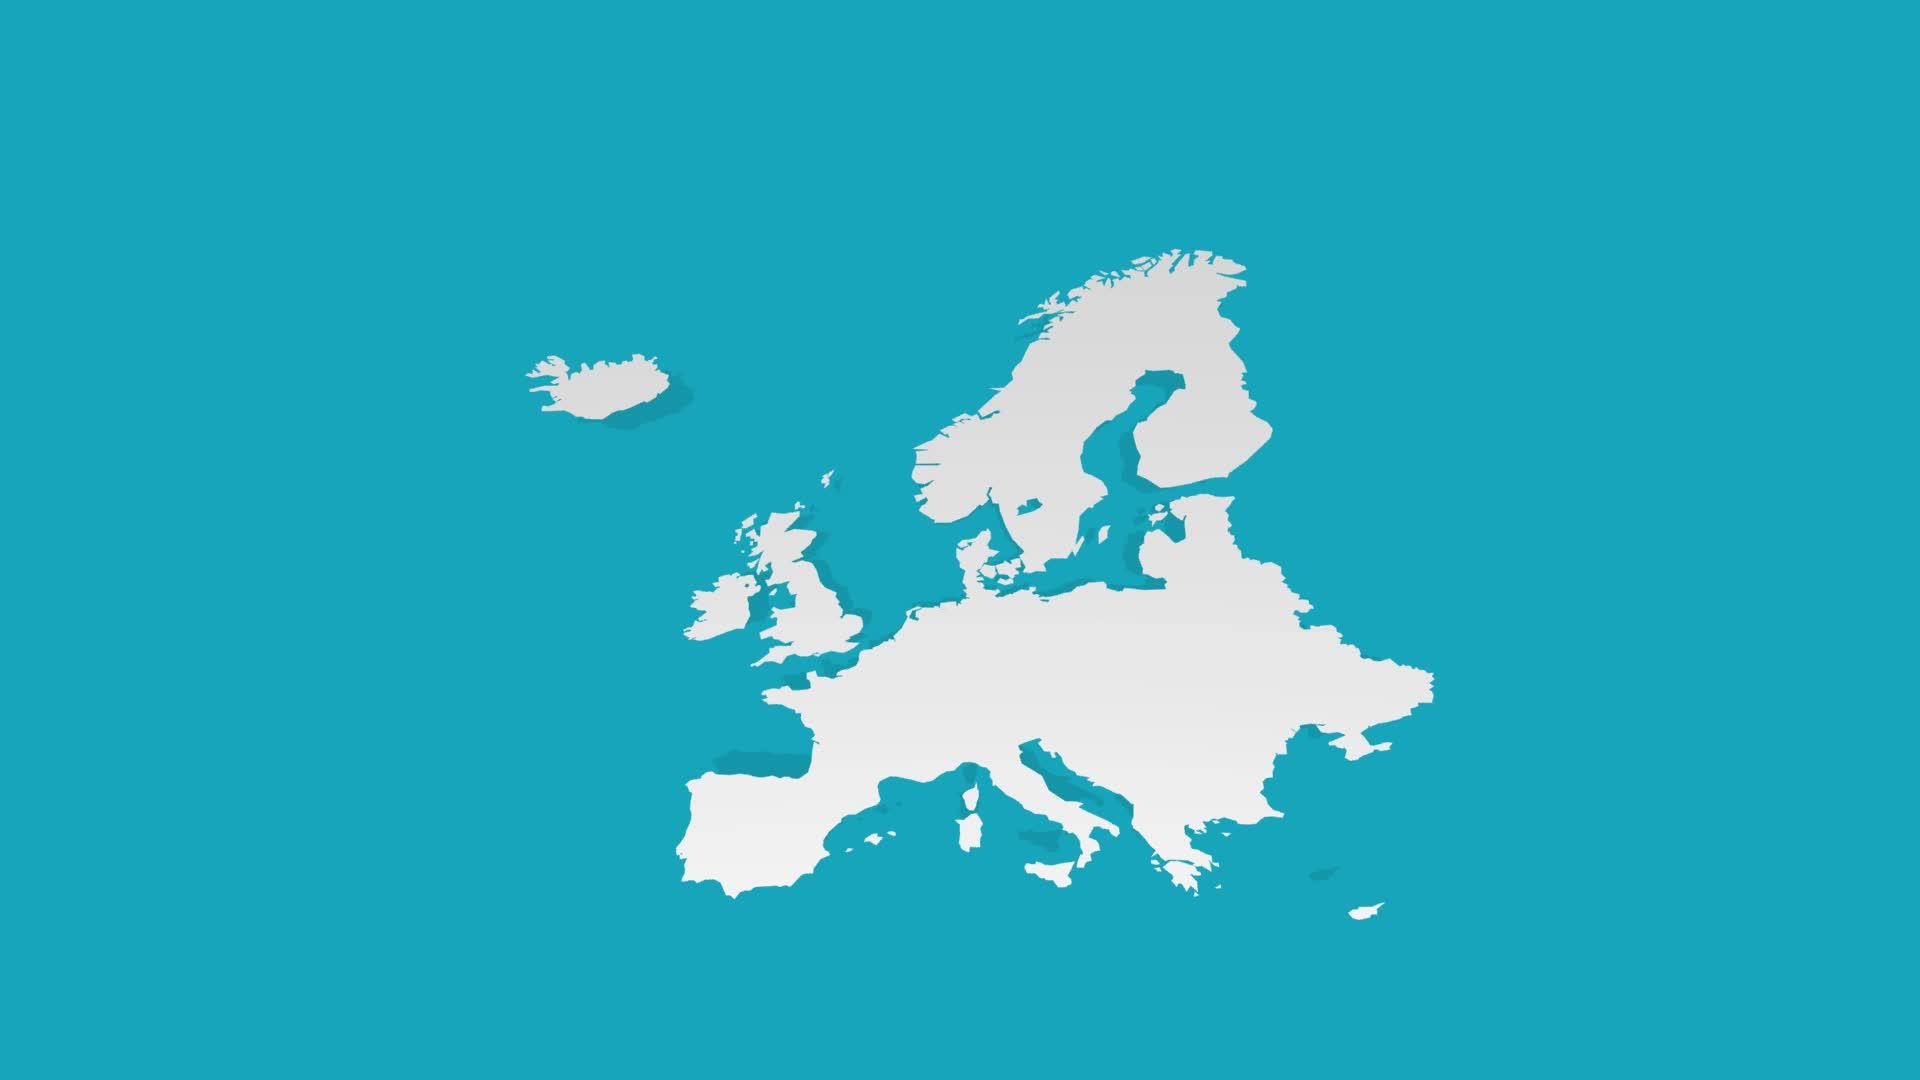 europe 3D GIFs